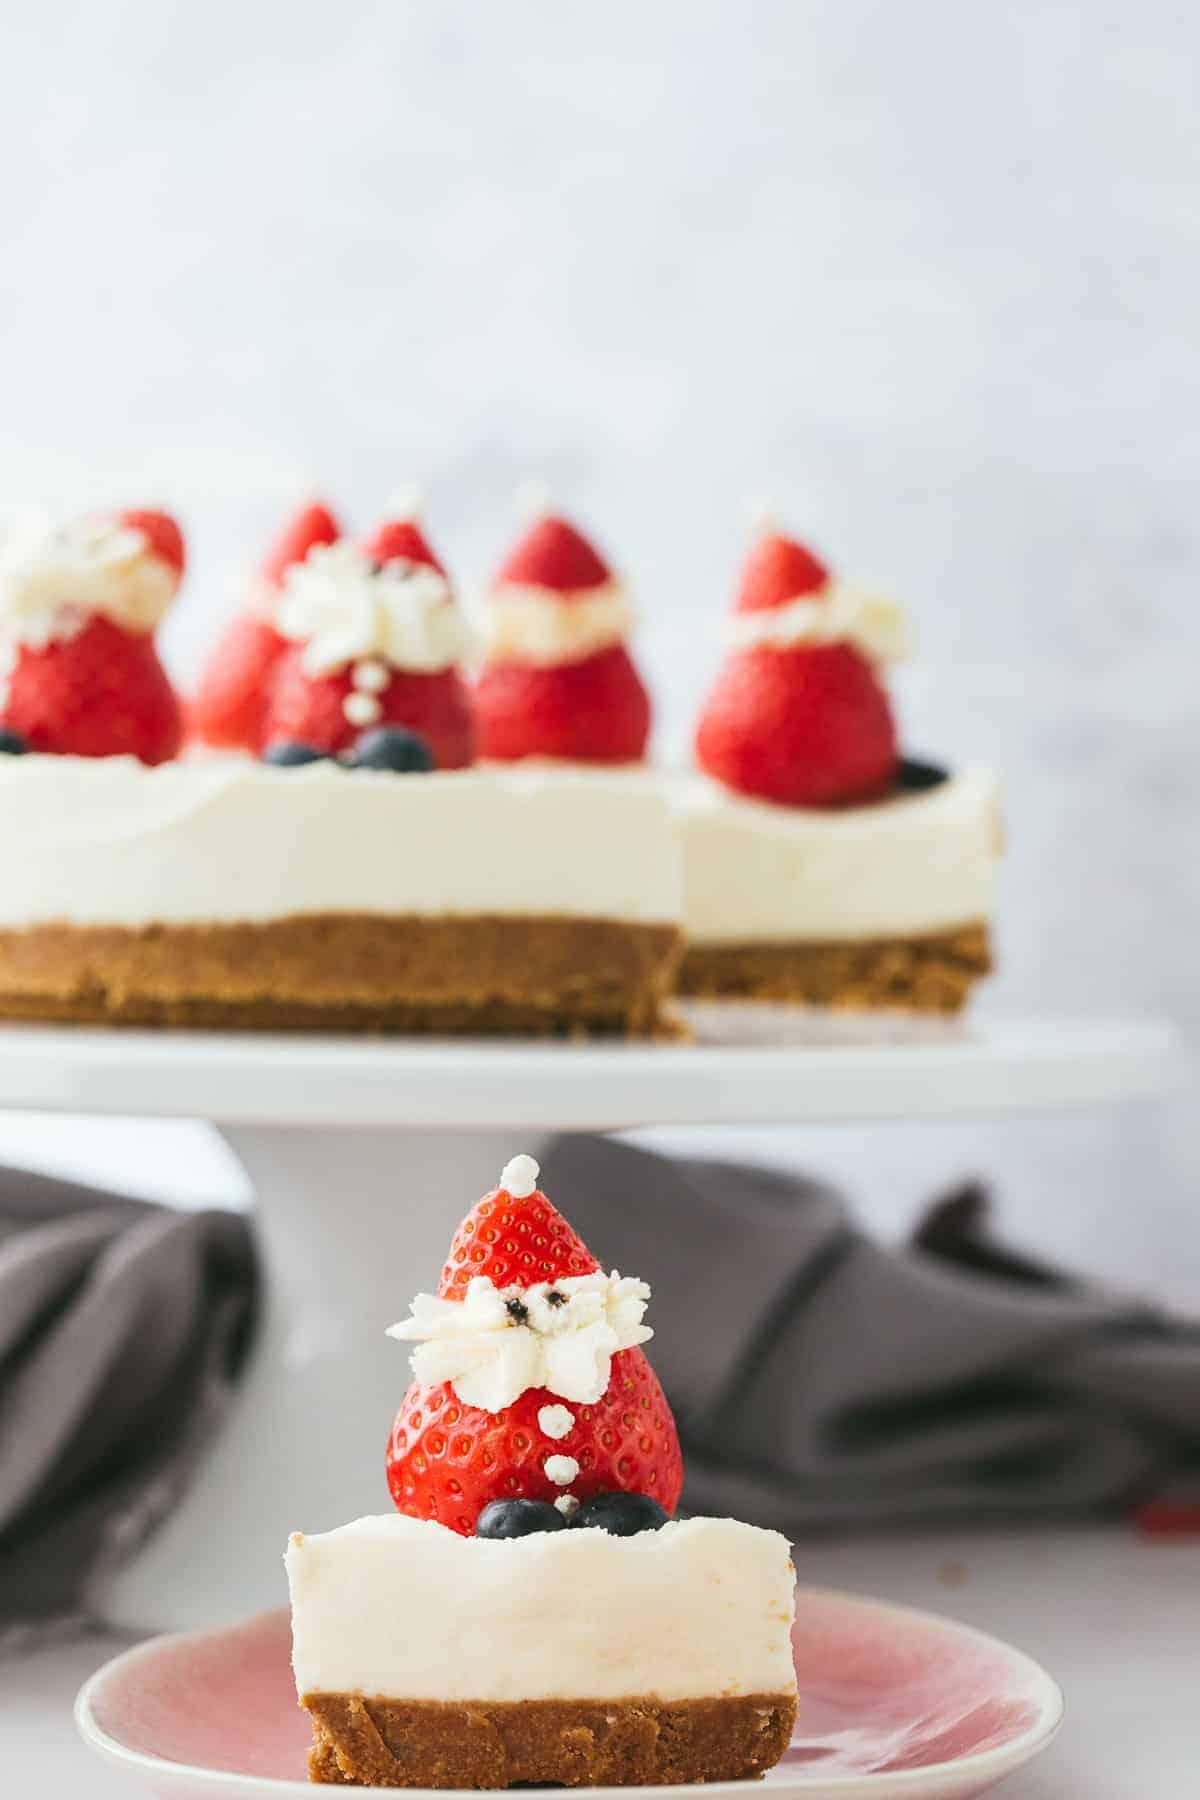 A Christmas Cheesecake.